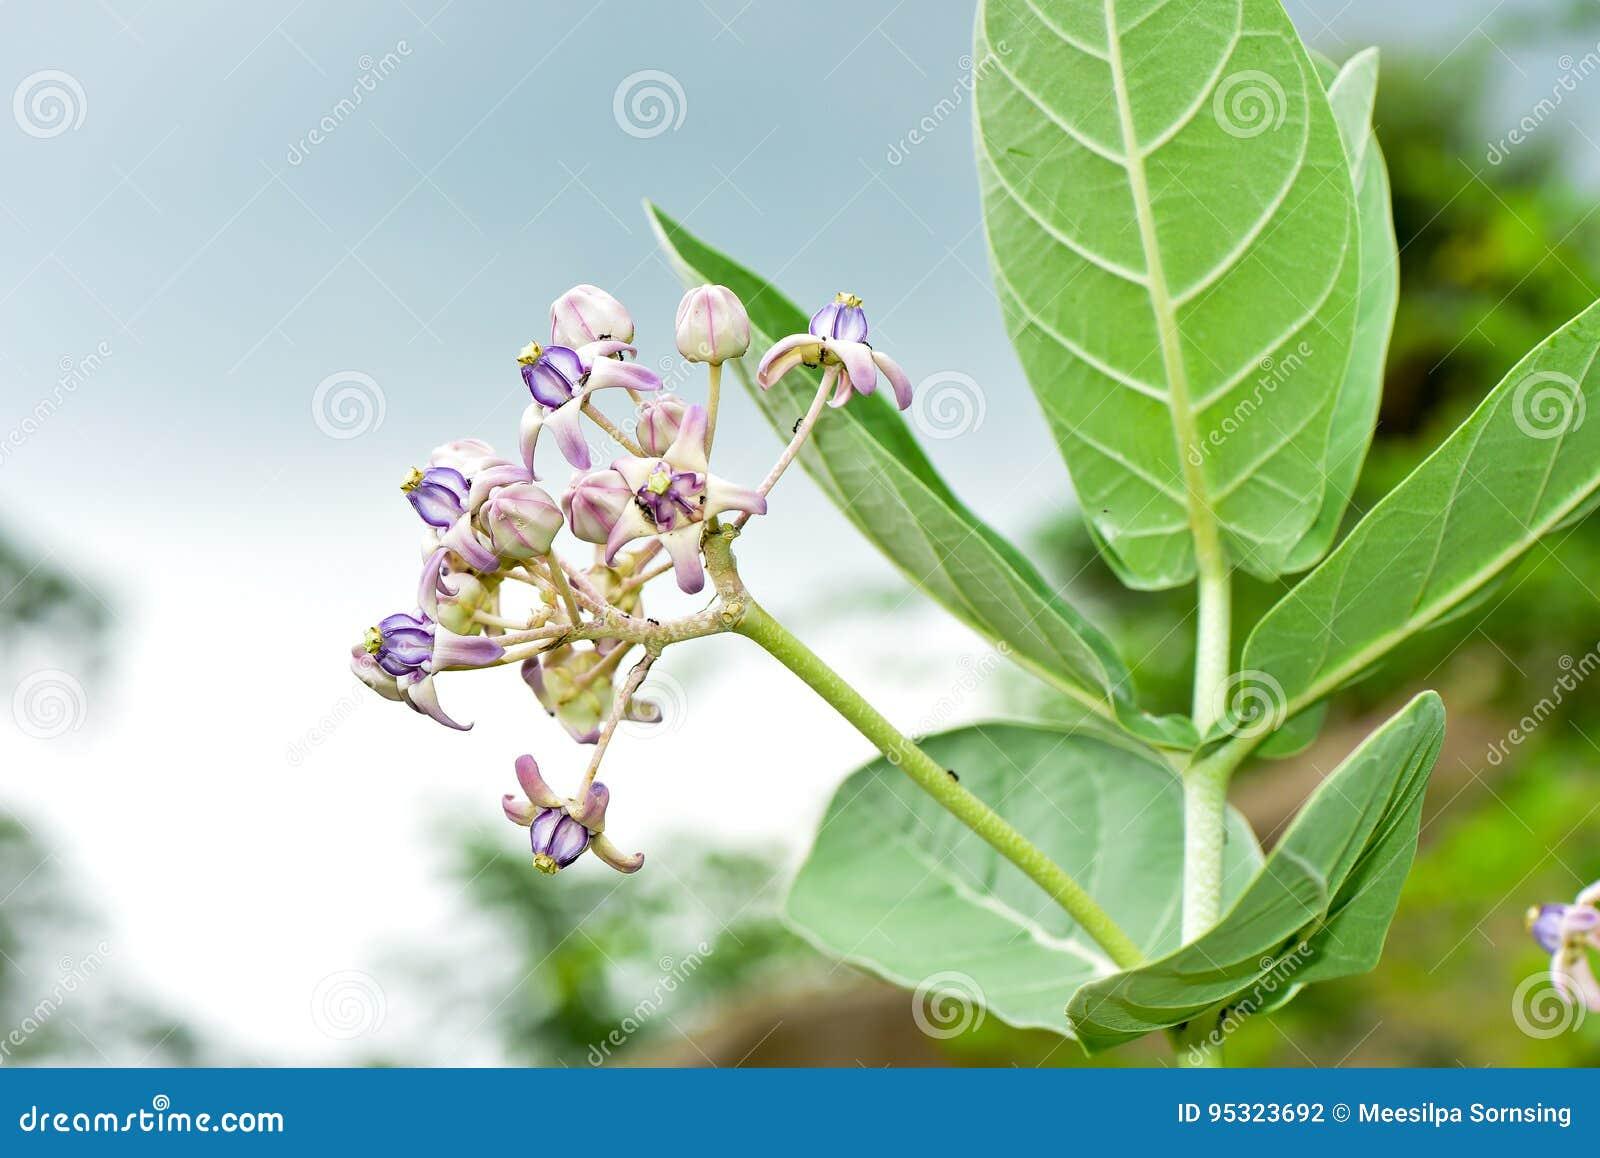 Purple crown flower,Giant Indian Milkweed,Gigantic Swallowwort